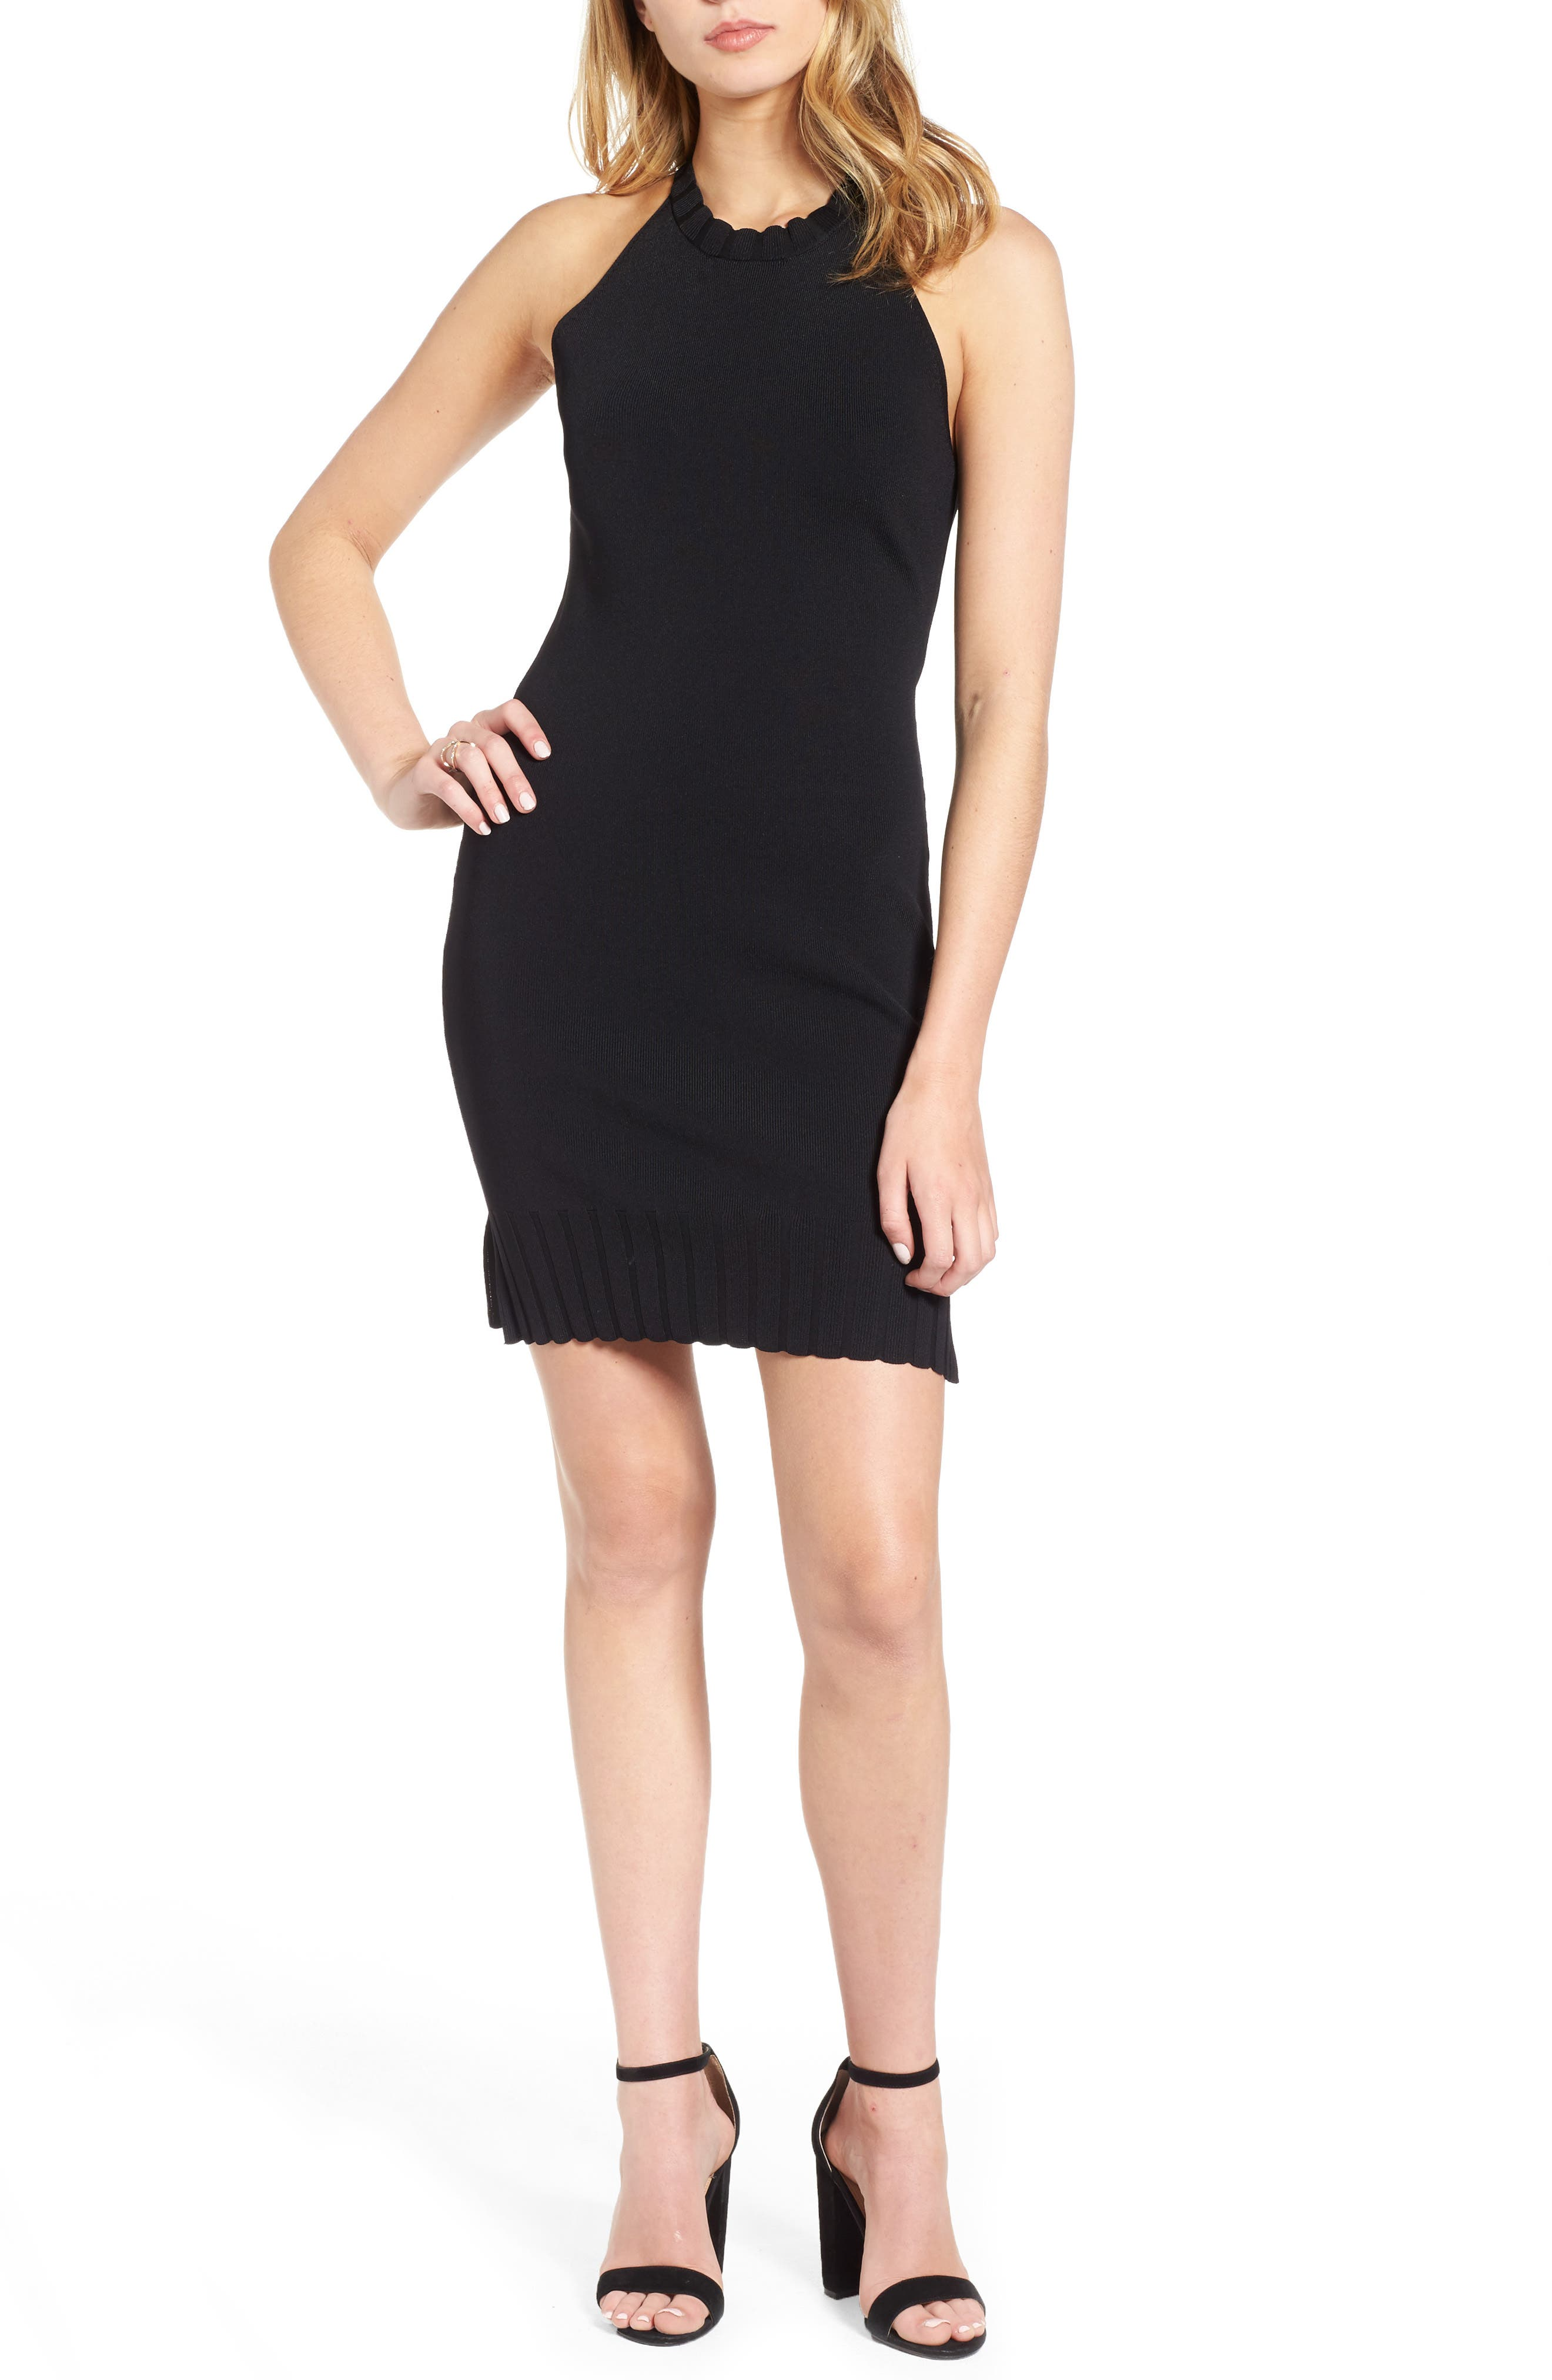 4SI3NNA Halter Body-Con Dress